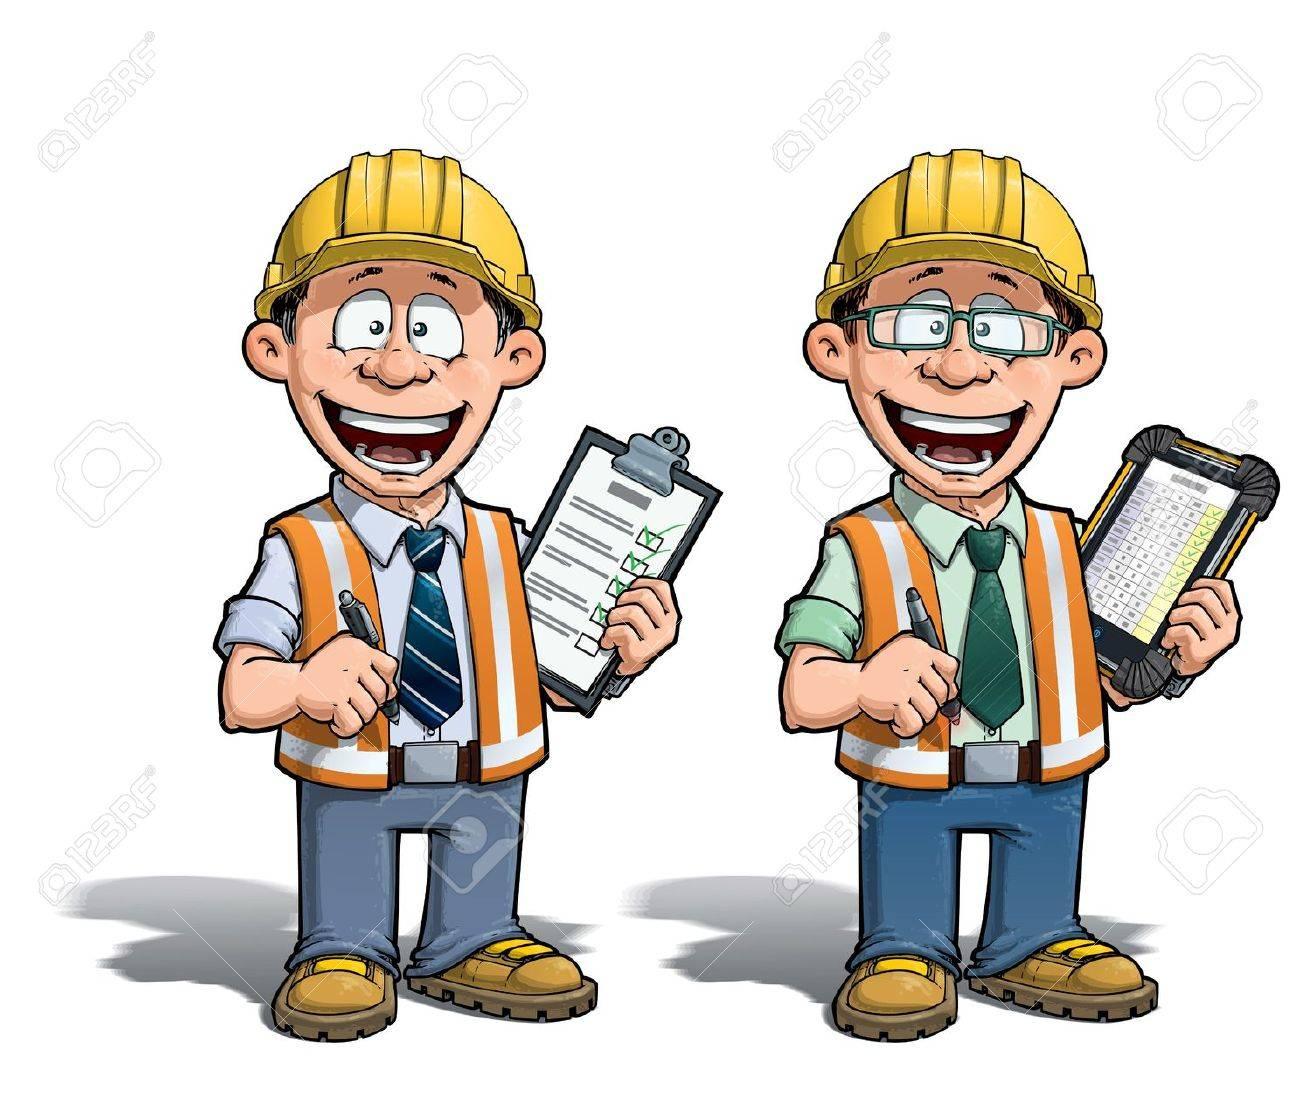 cartoon illustration of a construction worker supervisor checking